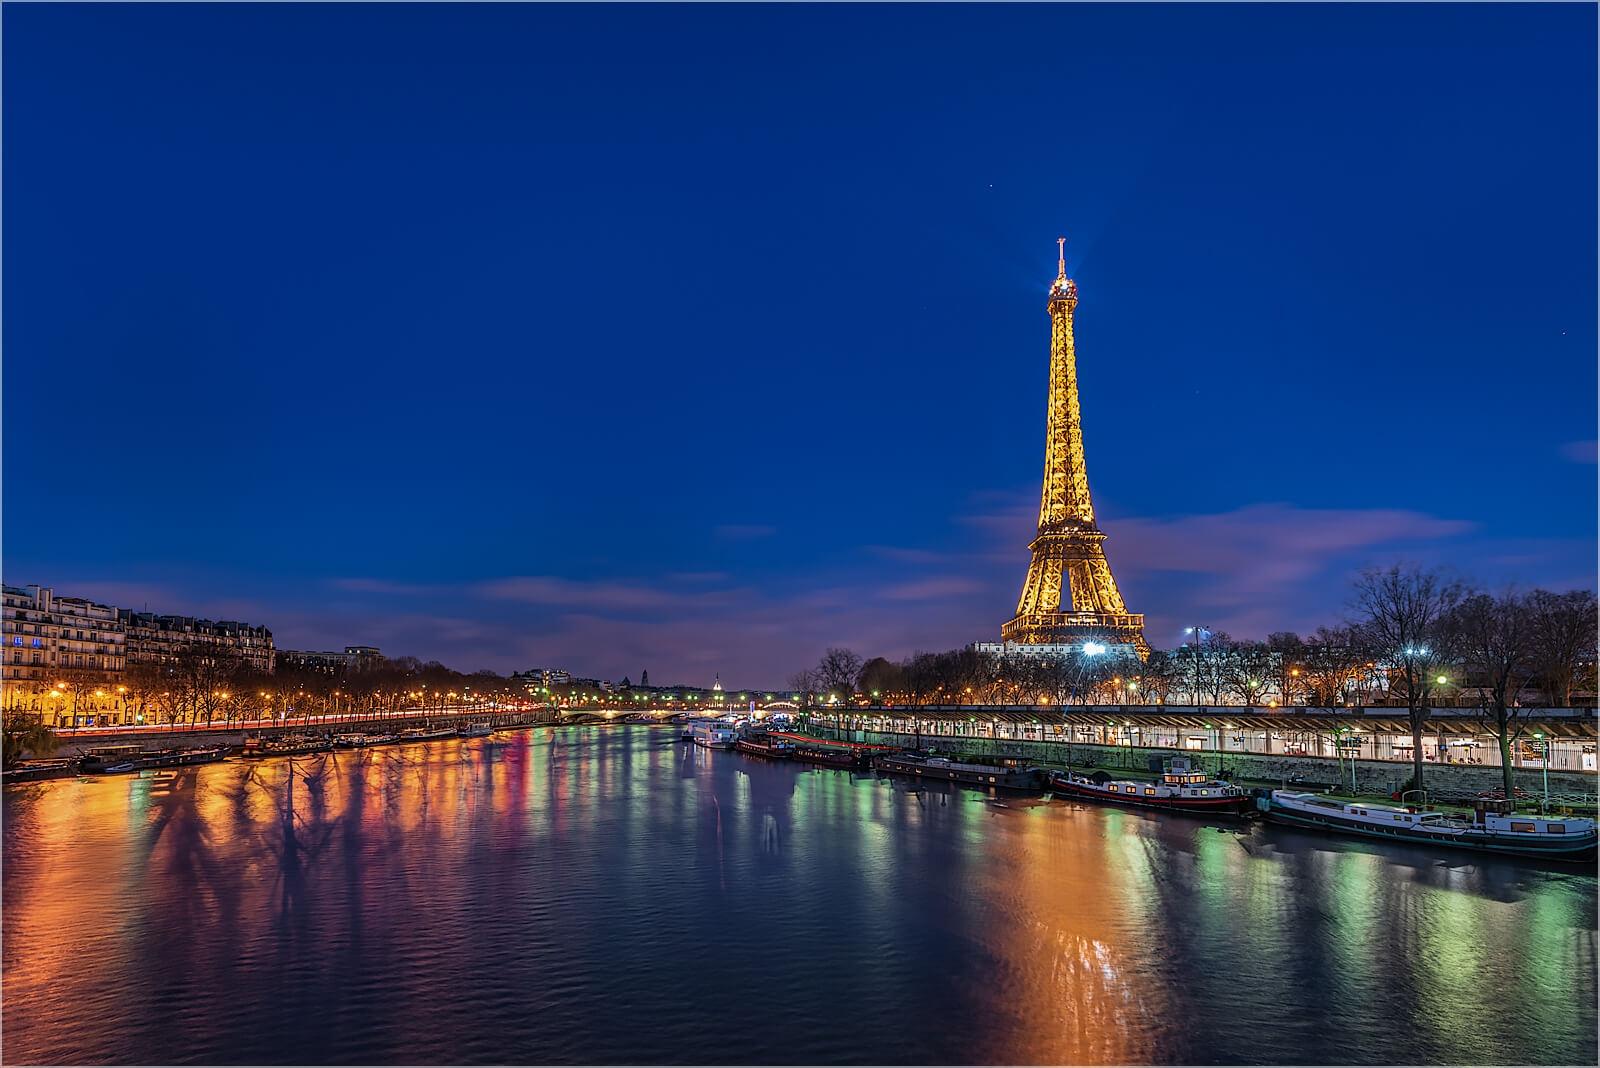 Wanddeko Paris Seine mit Eifelturm